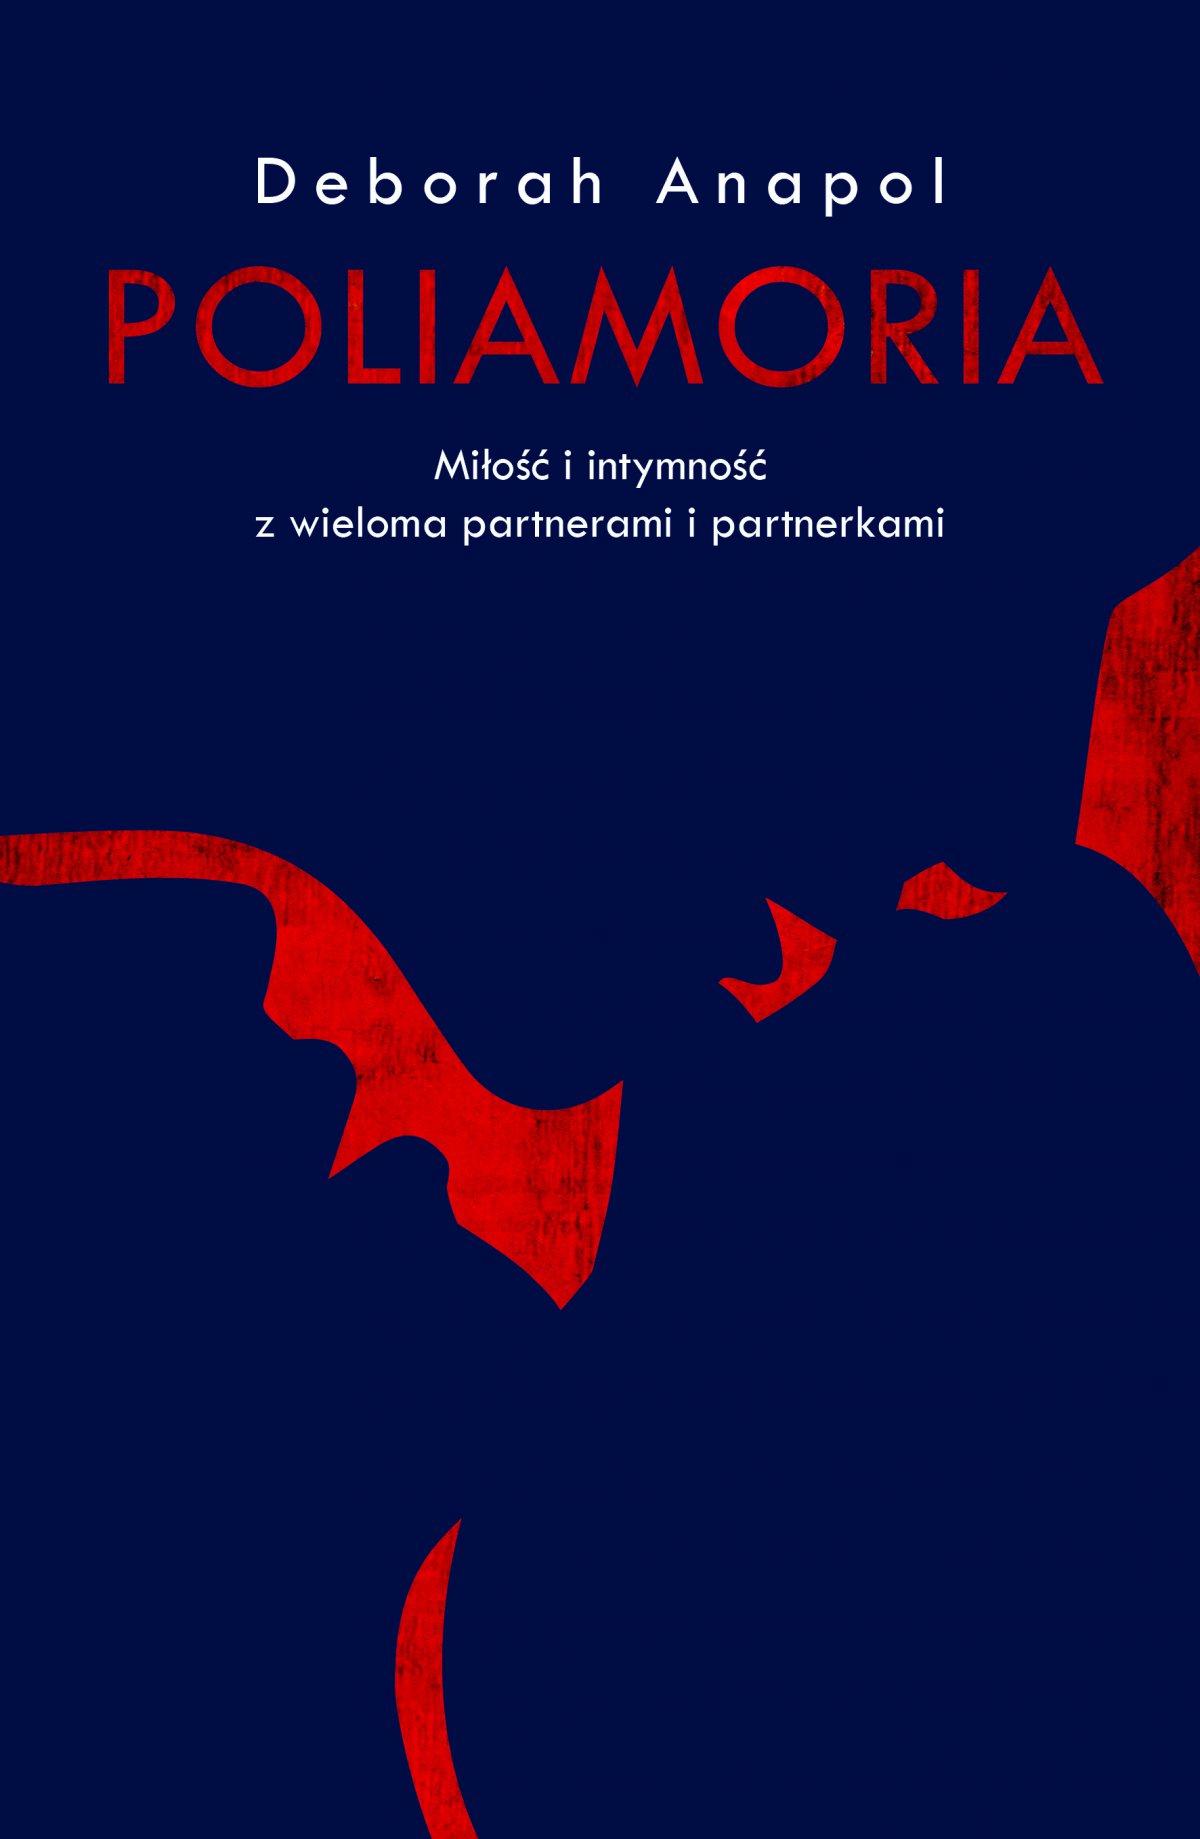 Poliamoria - Ebook (Książka na Kindle) do pobrania w formacie MOBI